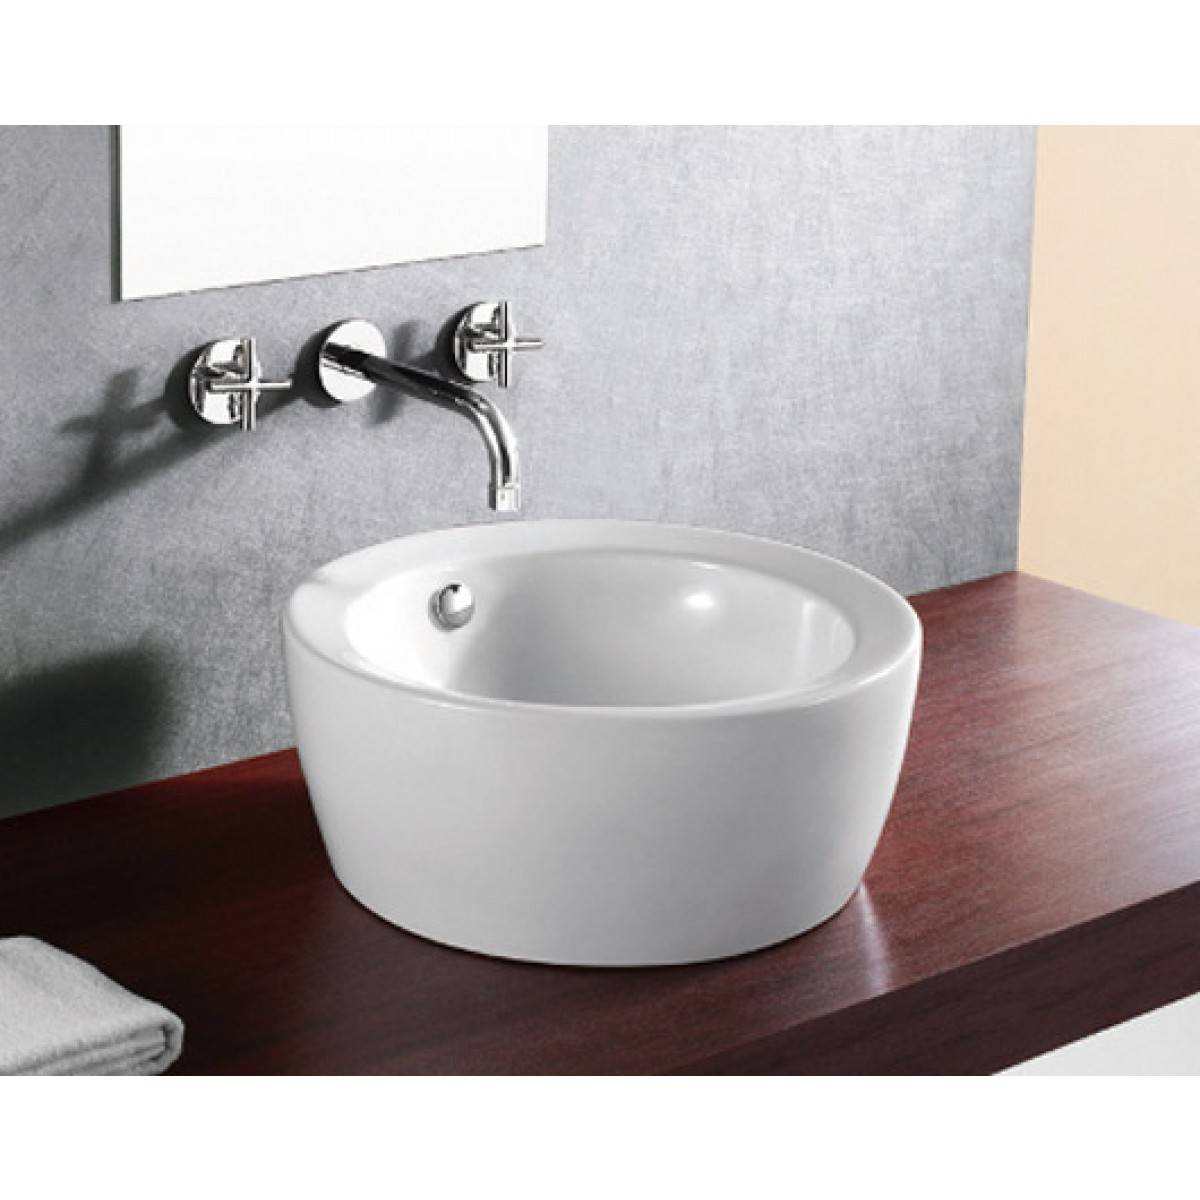 Round Porcelain Ceramic Countertop Bathroom Vessel Sink 18 X 7 3 4 Inch